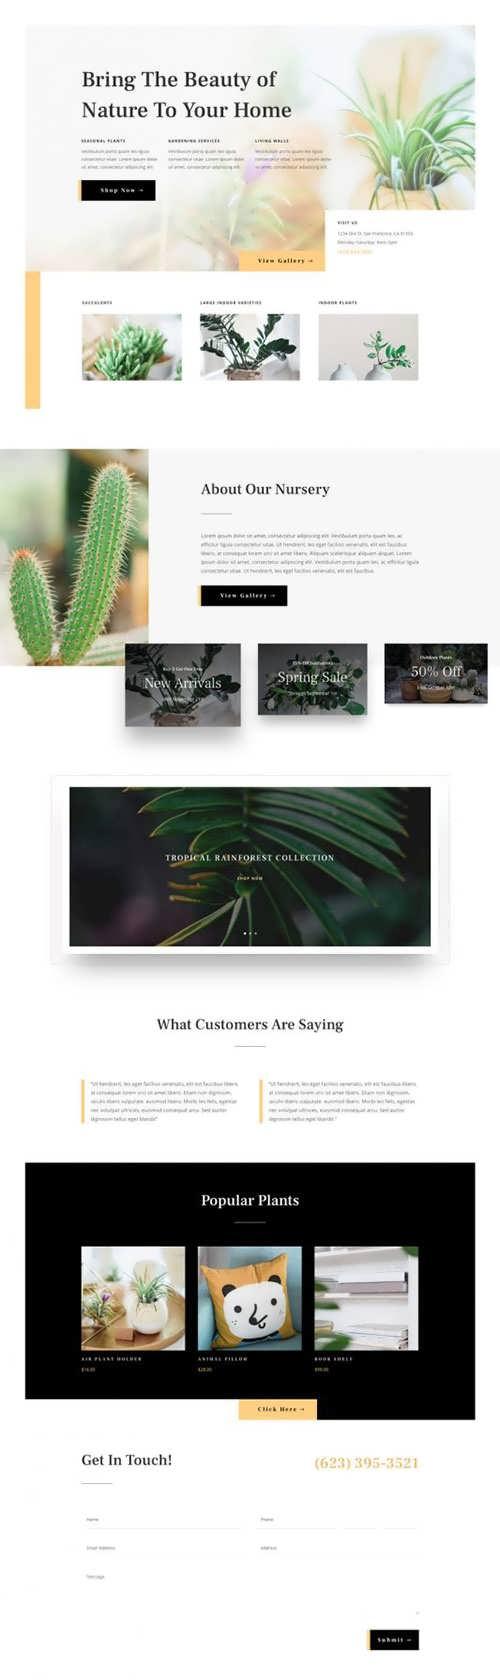 plant nursery landing page